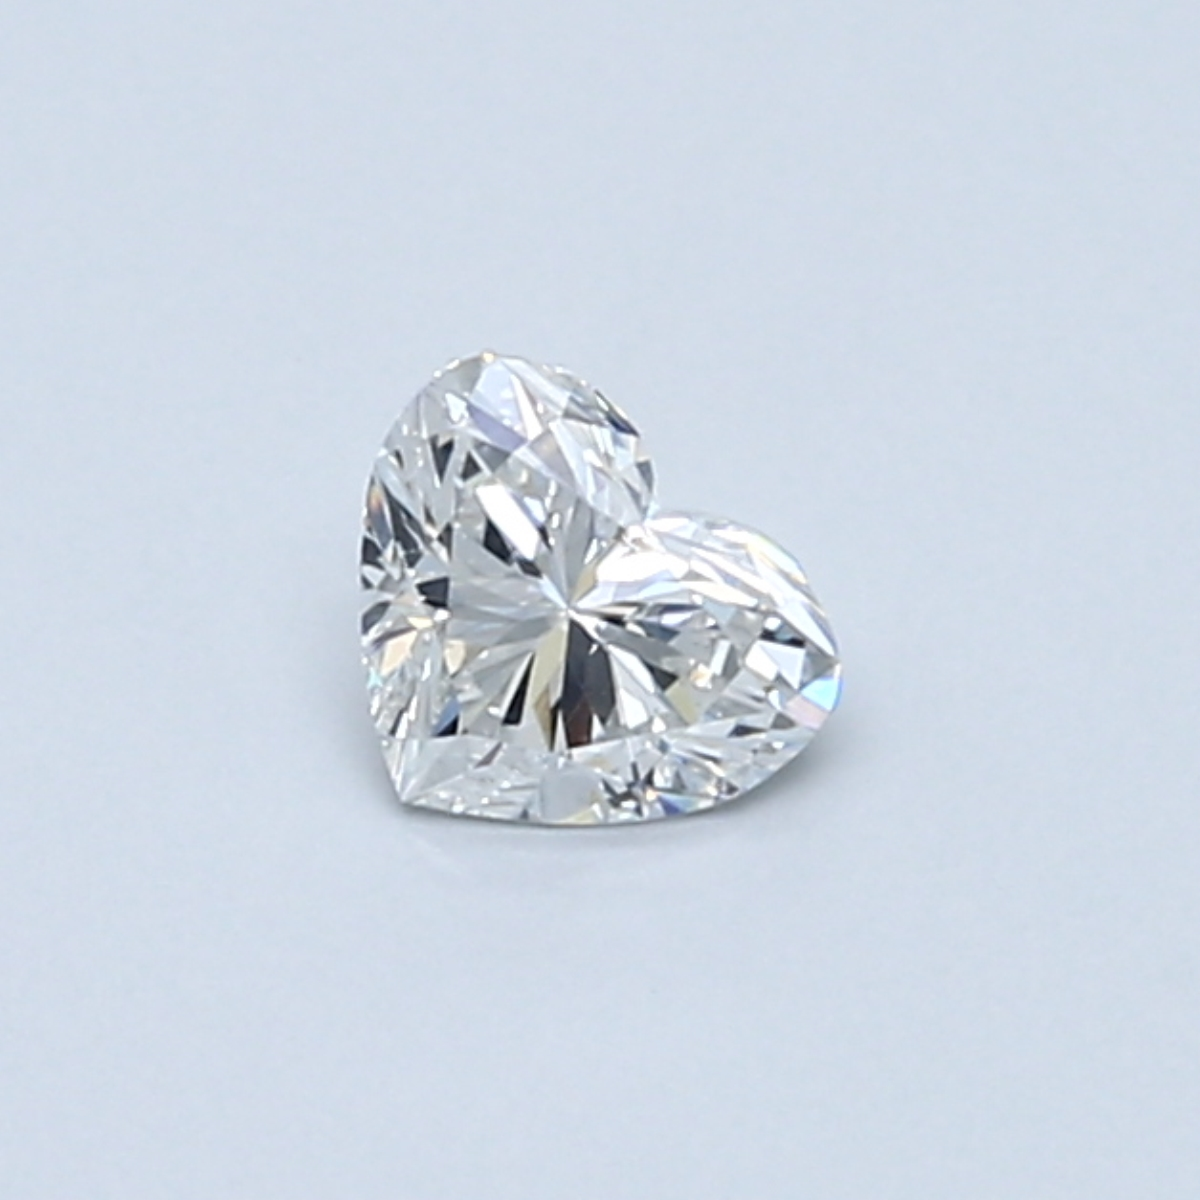 0.30-Carat Heart Shaped Diamond